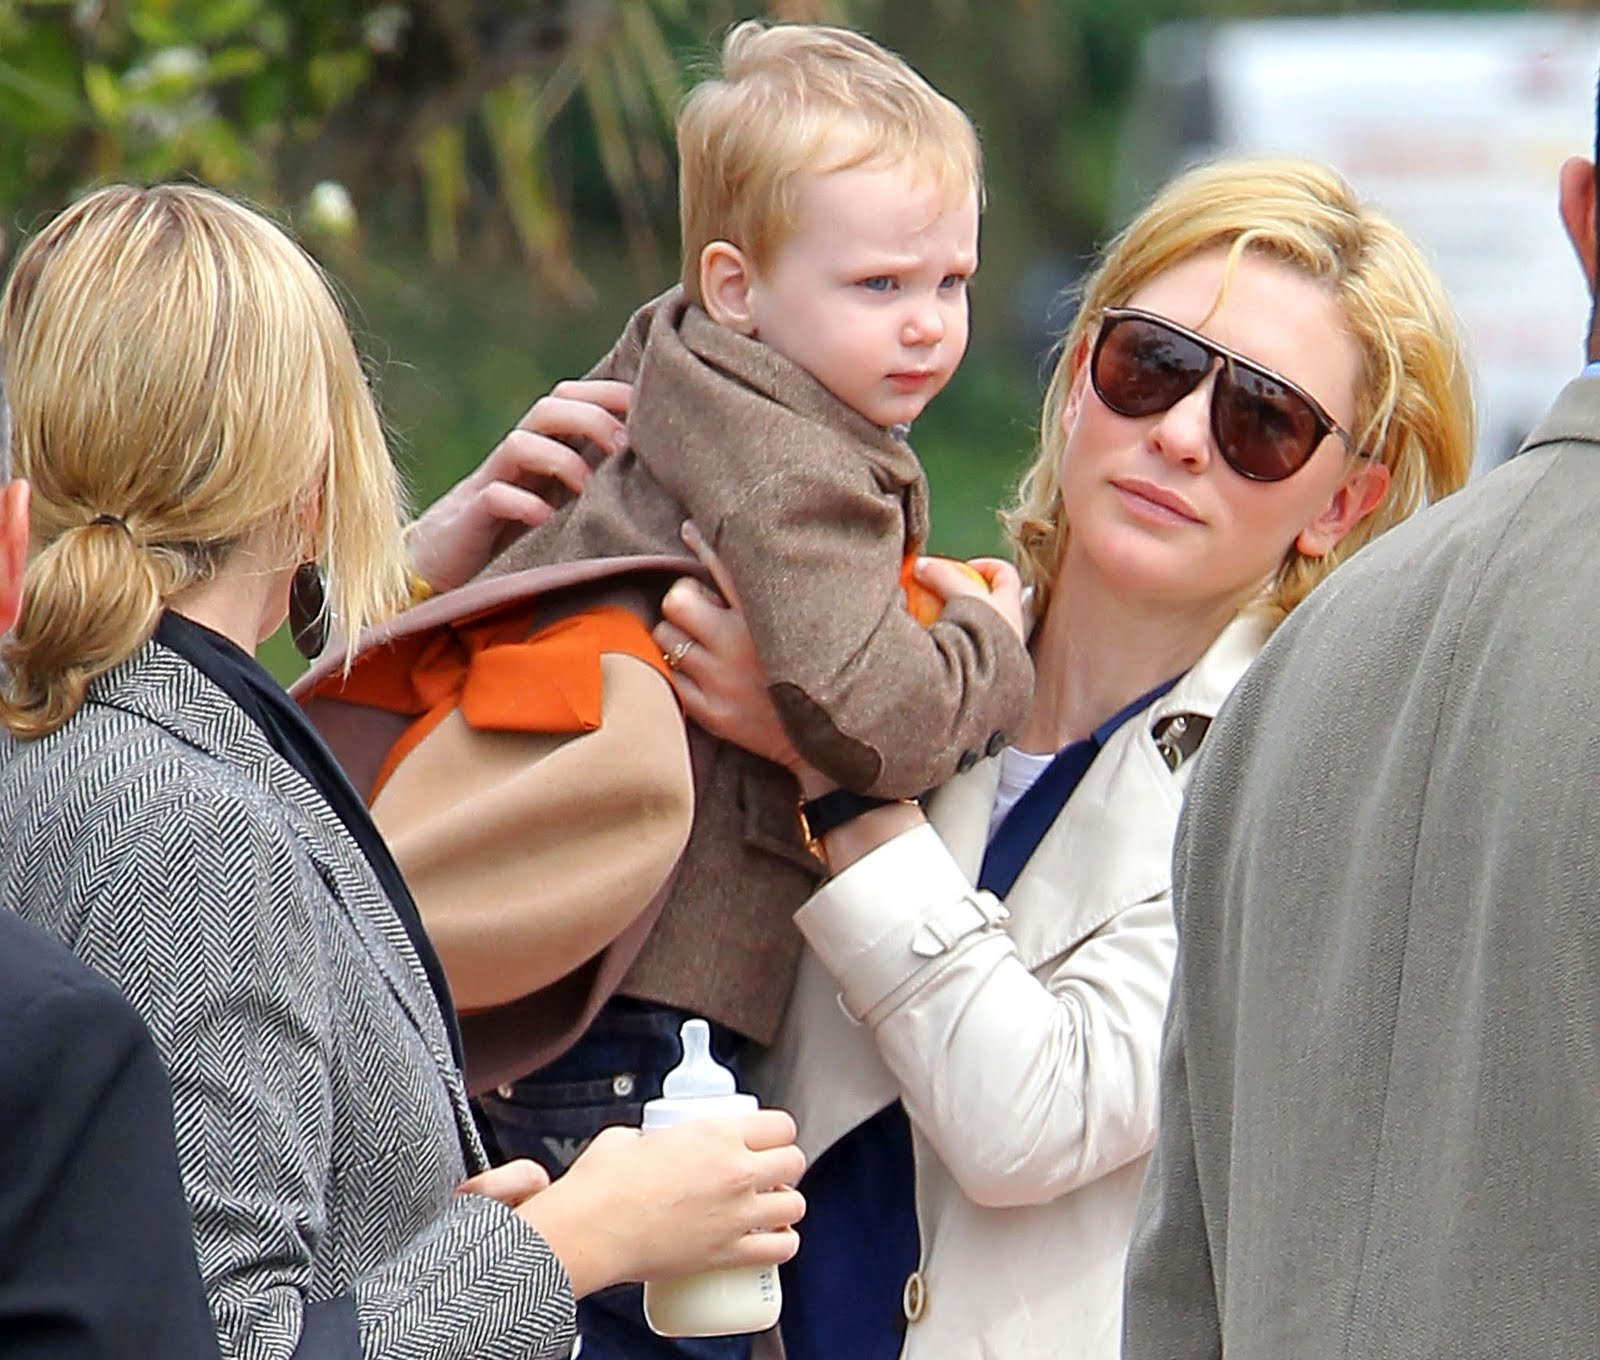 http://1.bp.blogspot.com/_pXNLY6HB8eU/S-nEgVBMC5I/AAAAAAABY_0/2pZ_e_b3bBU/s1600/Cate_Blanchett_May11_0302main.jpg